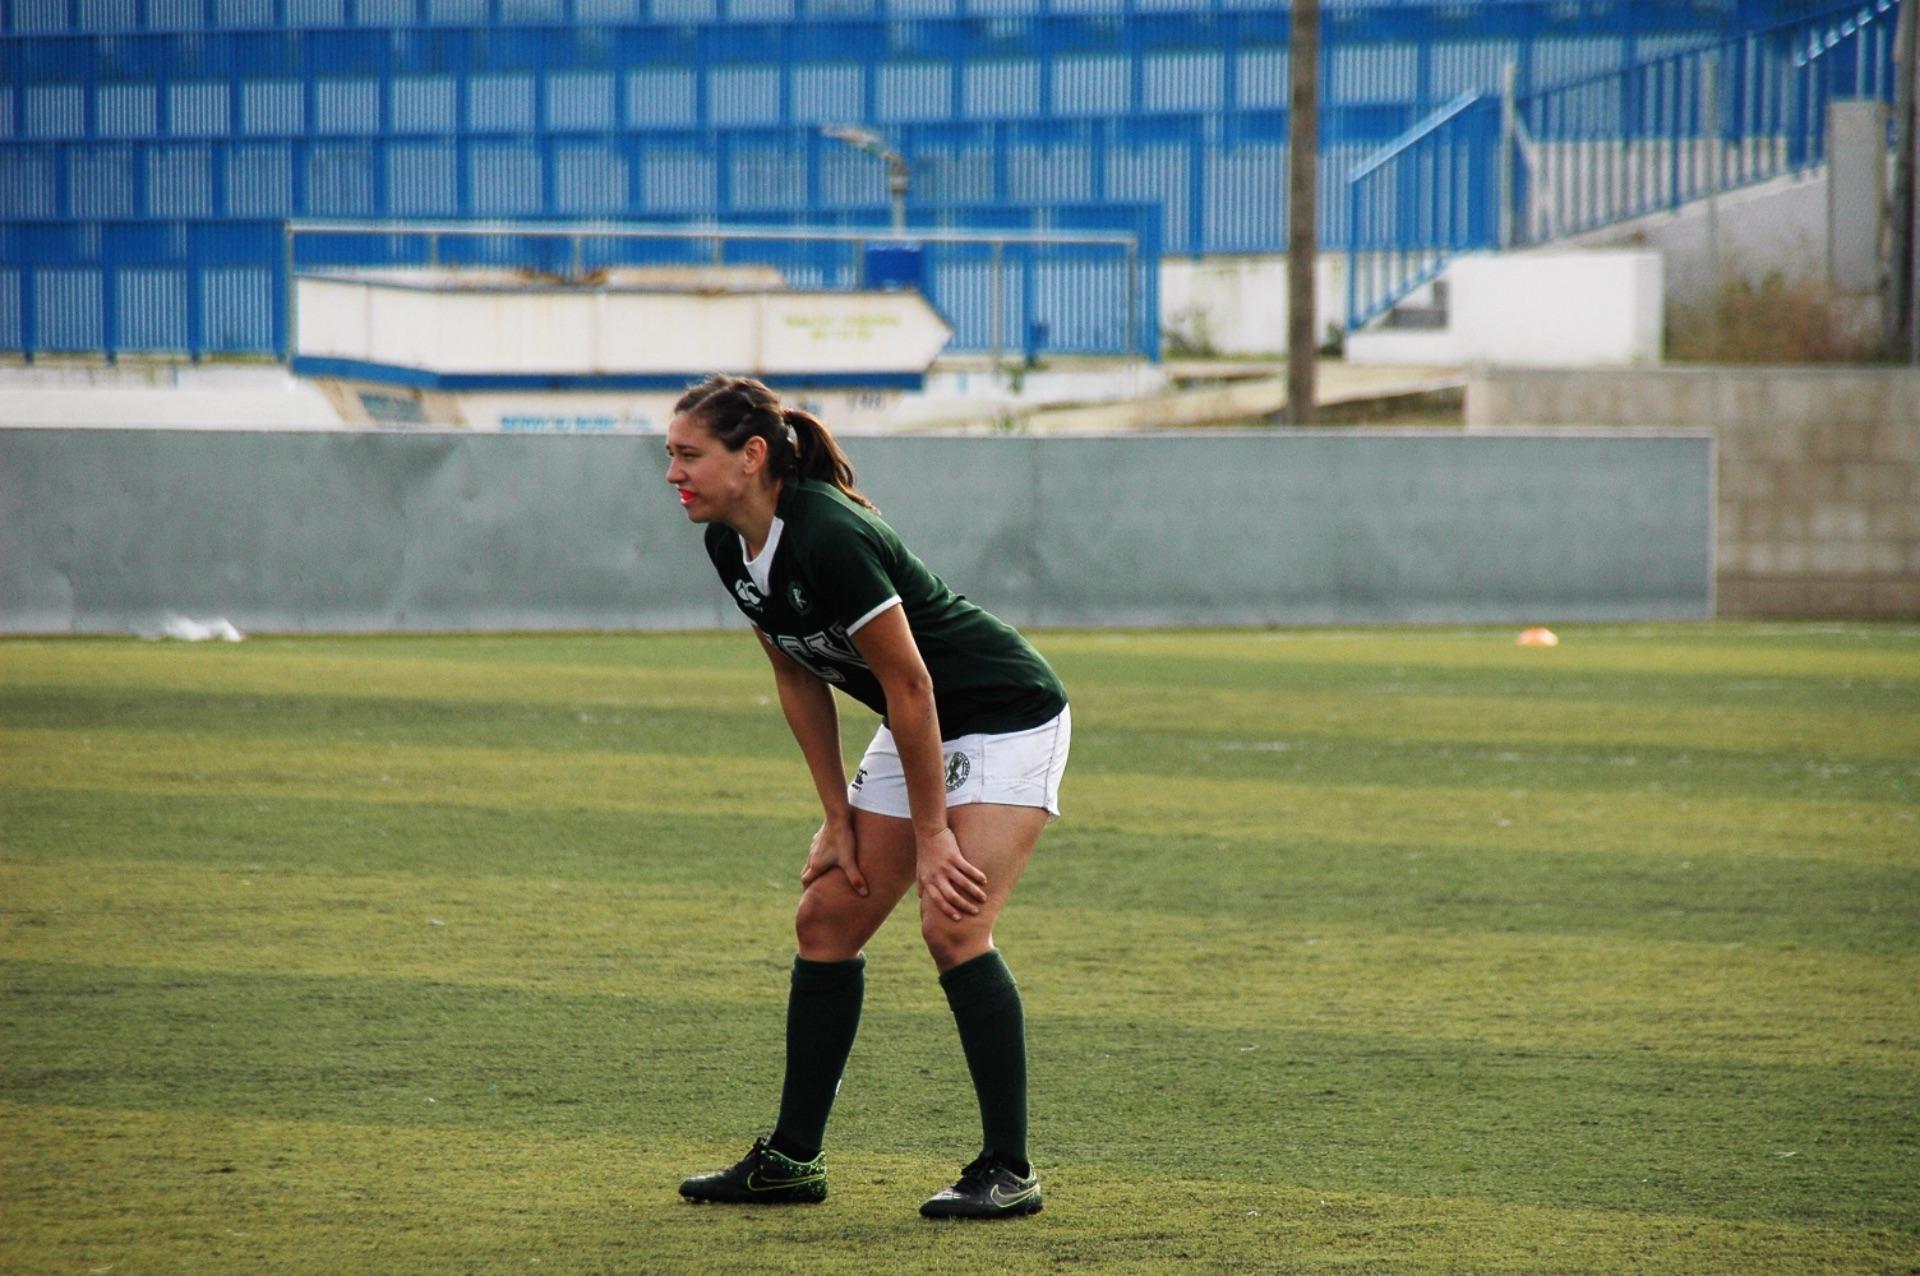 Loreto Sancho Mengod